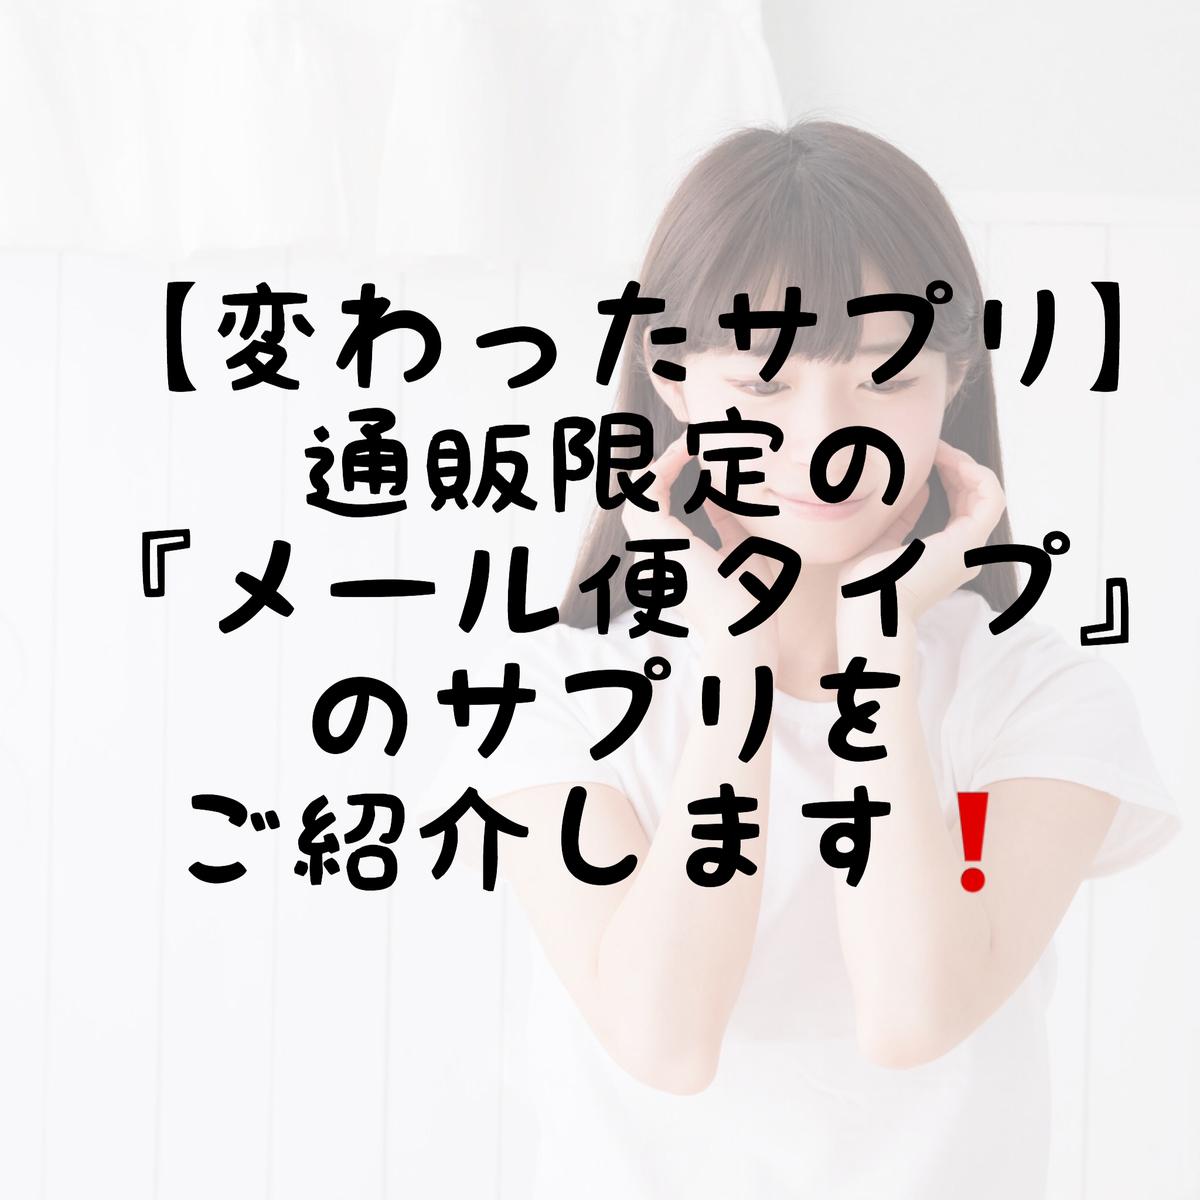 f:id:nokonoko_o:20200606180205j:plain